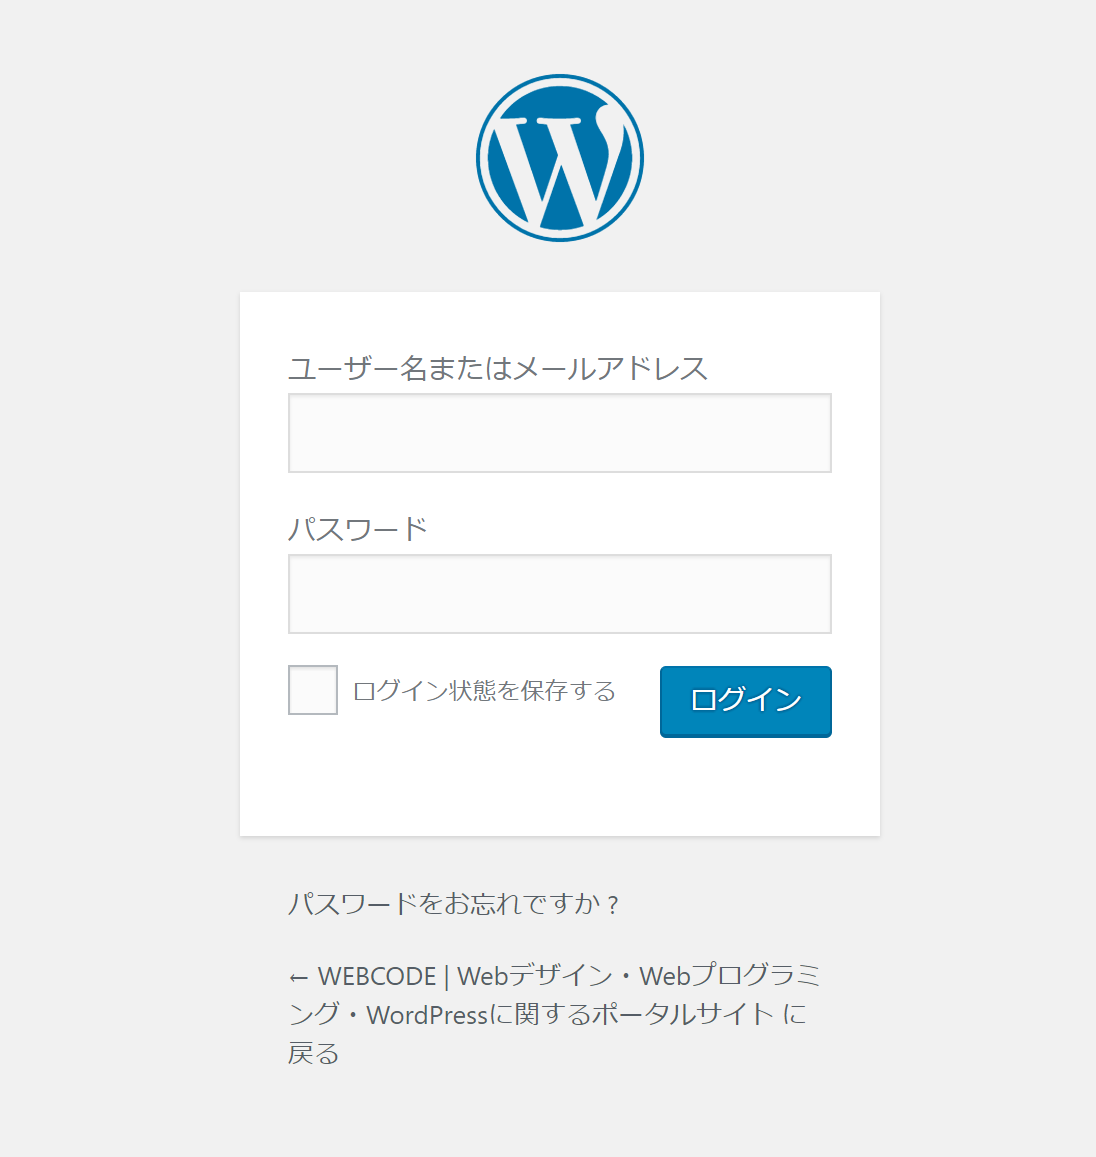 wplogin - WordPressにログインできない9パターン!その対処方法を初心者向けに徹底解説